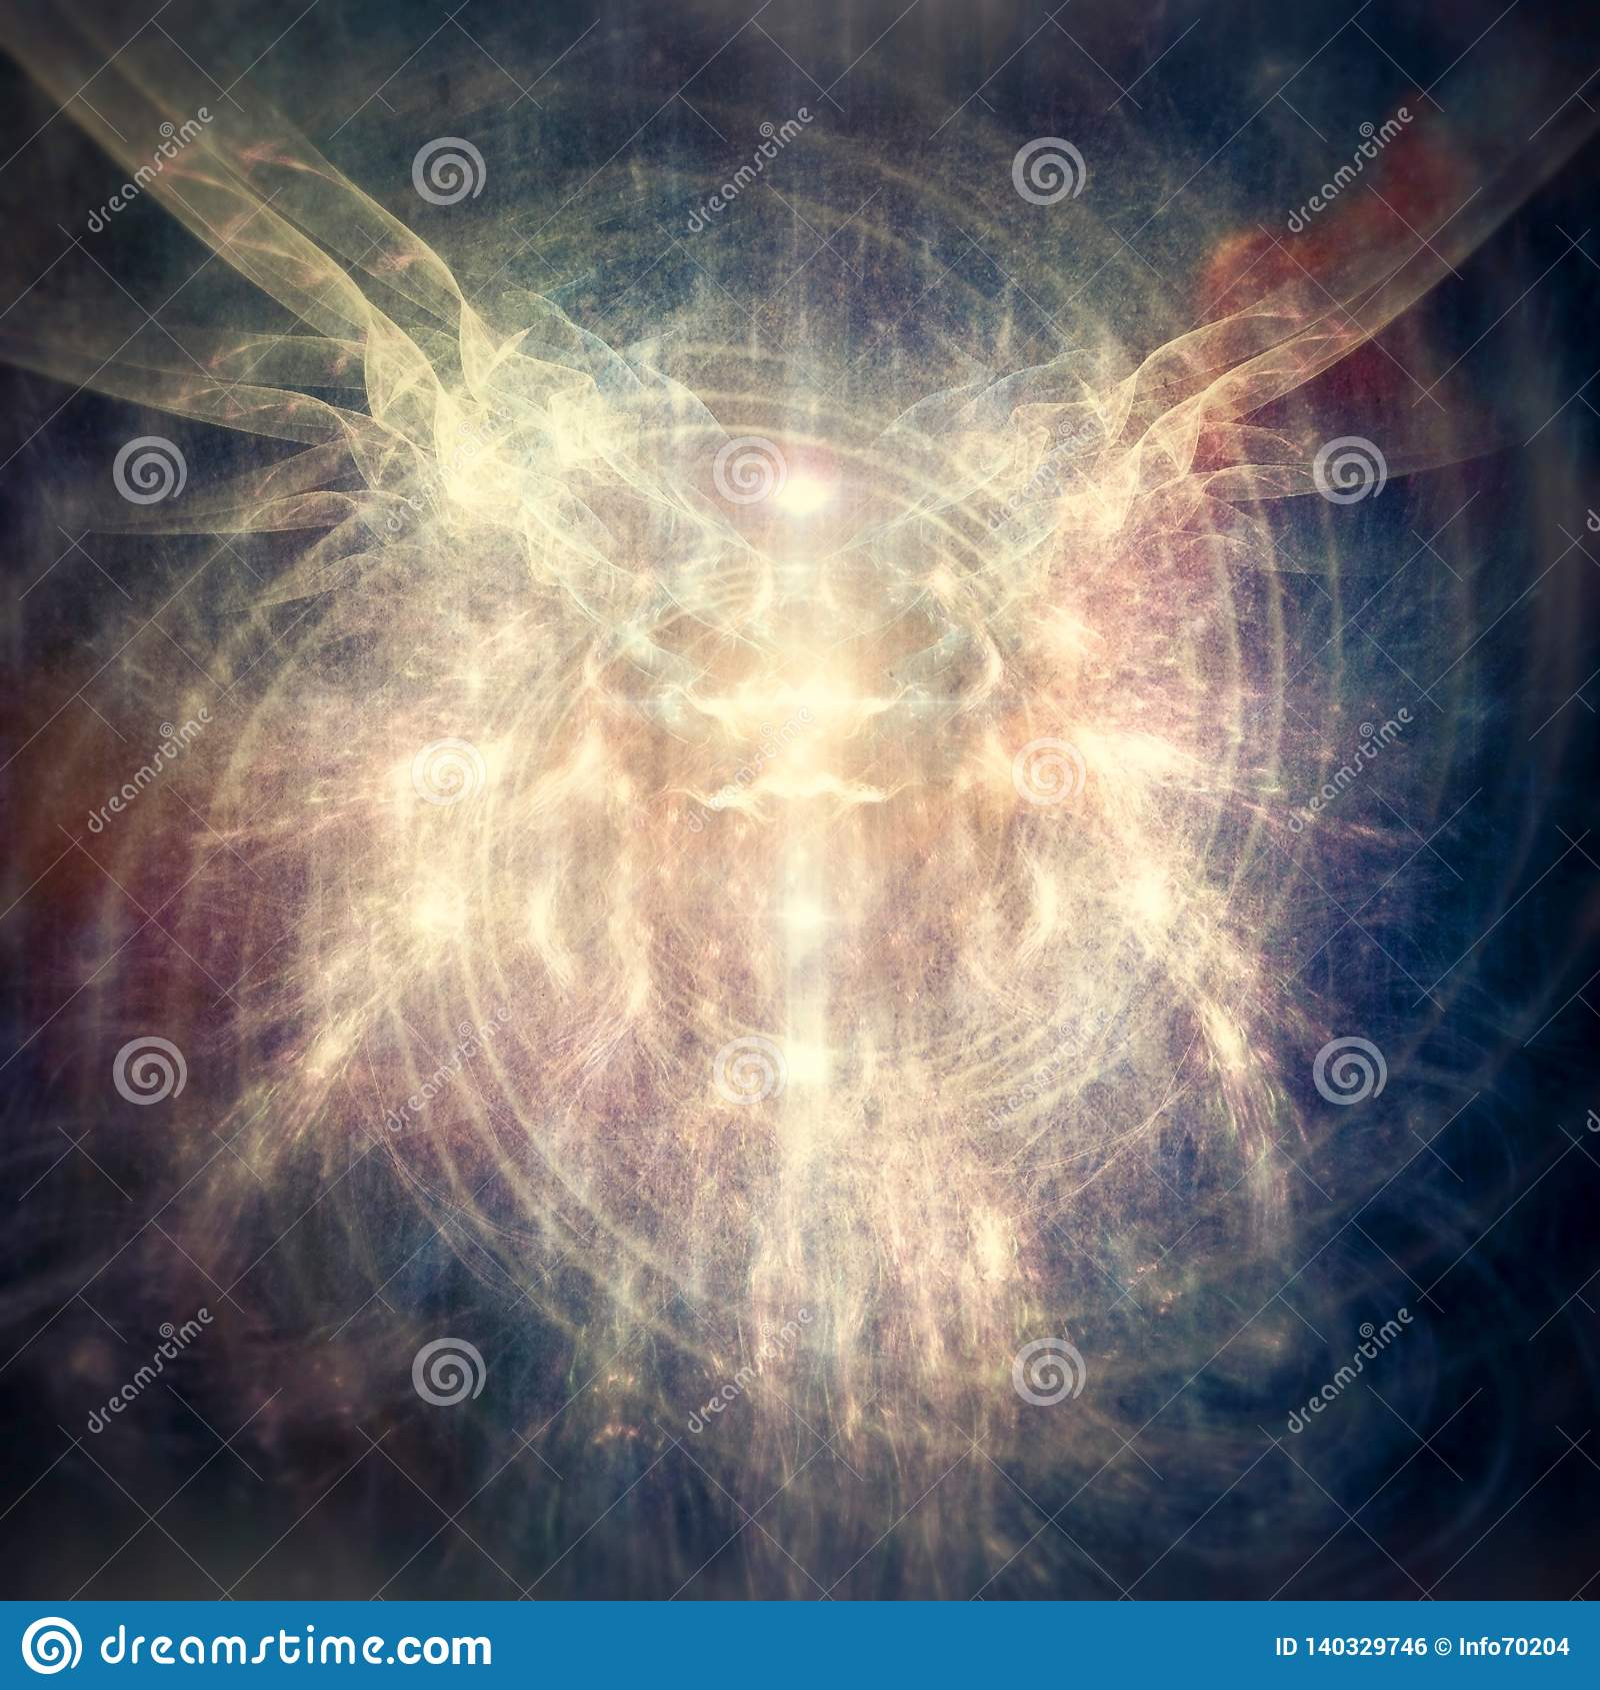 Bello estratto Angel Being Emanating Pastel Light etereo in una spirale